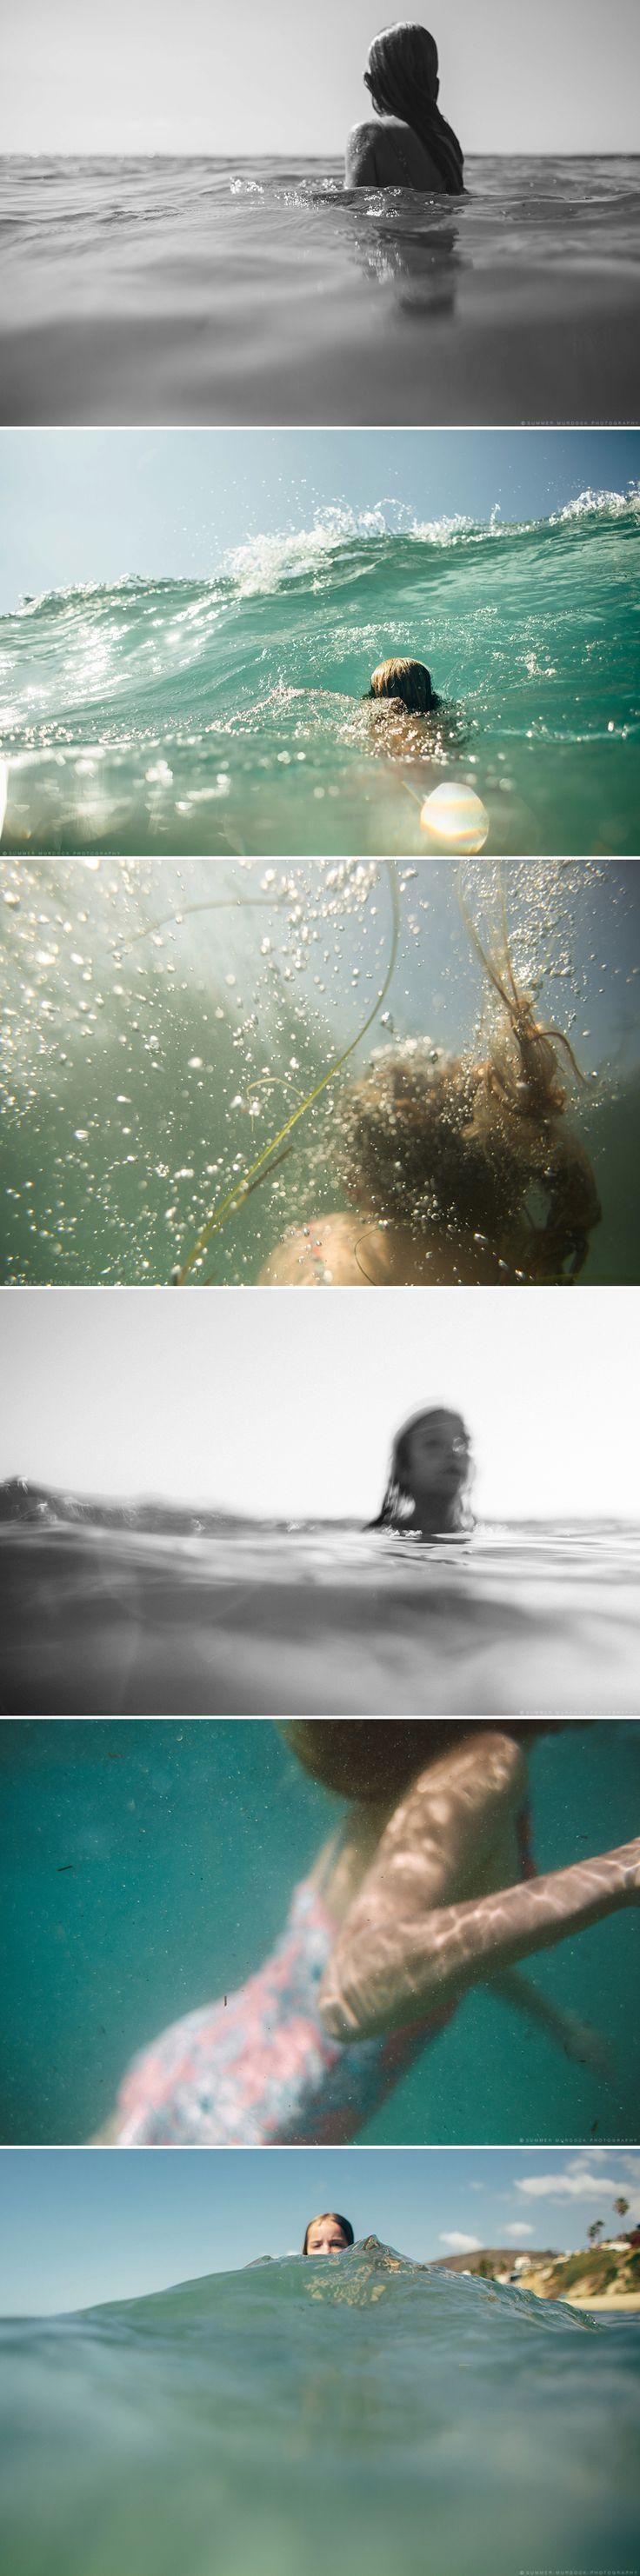 Summer Murdock Photography Salt Lake City People and Lifestyle Photographer Unde...